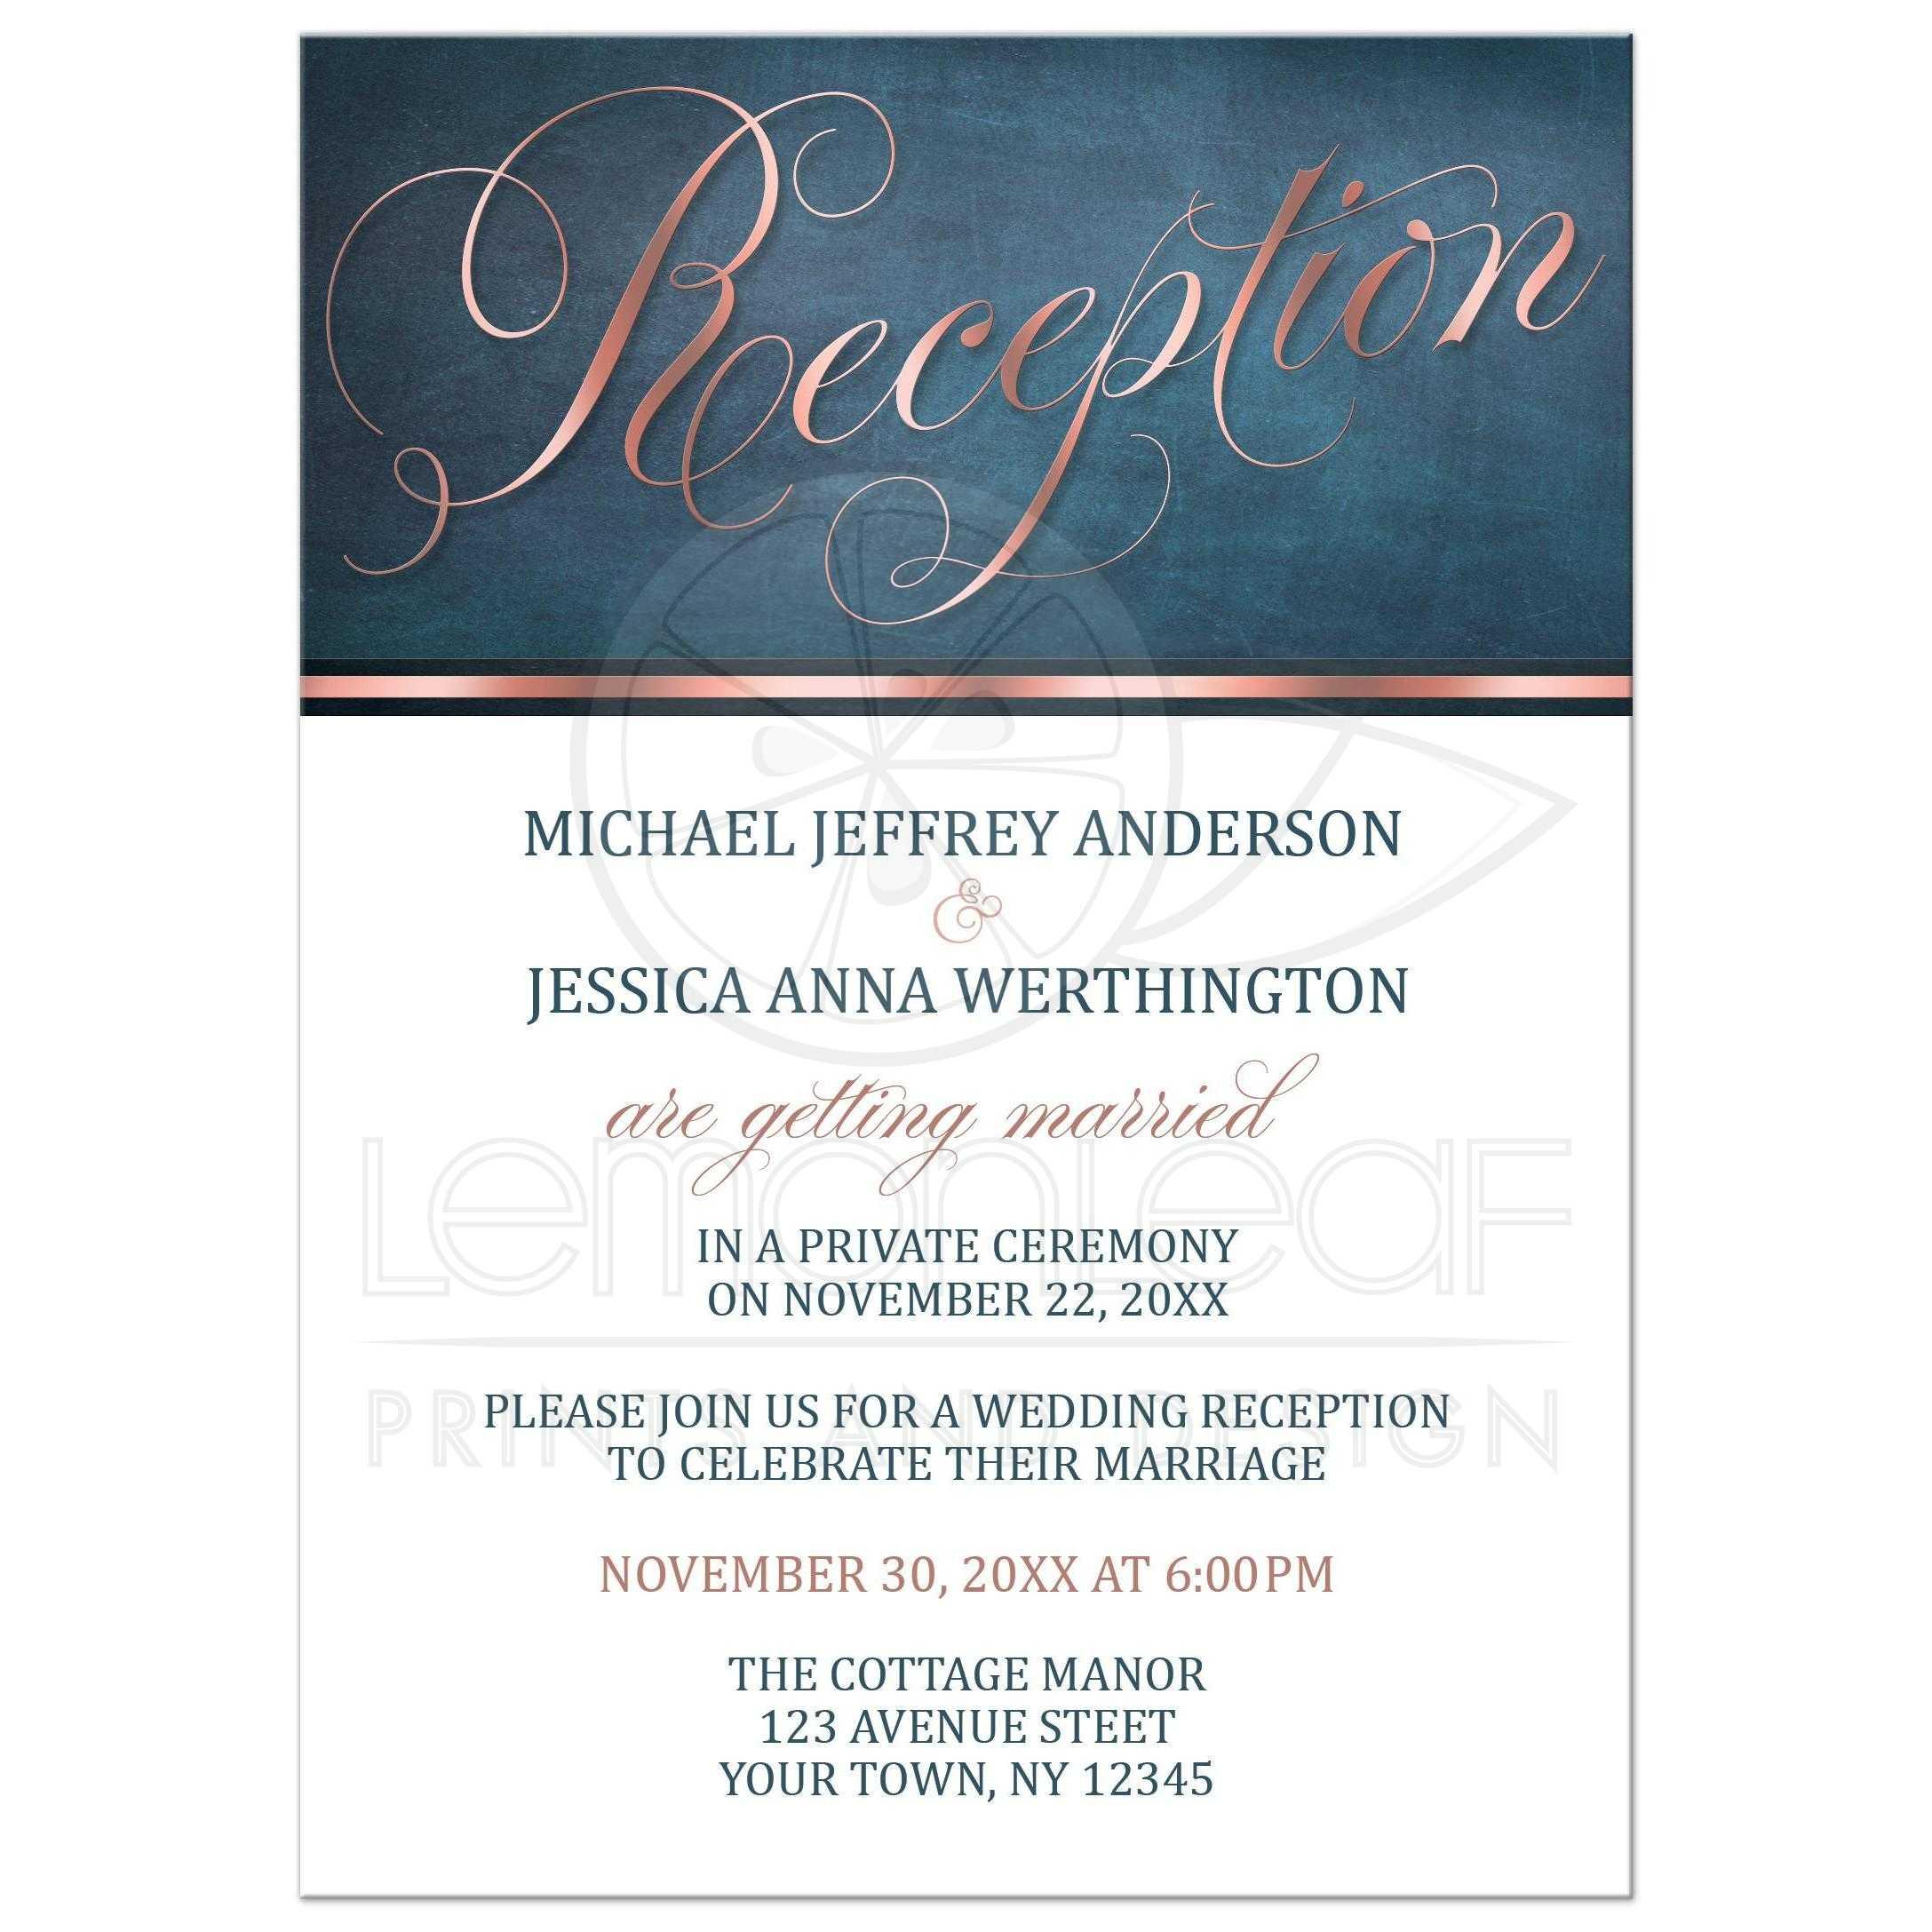 Reception Only Invitations - Copper Blue Elegant